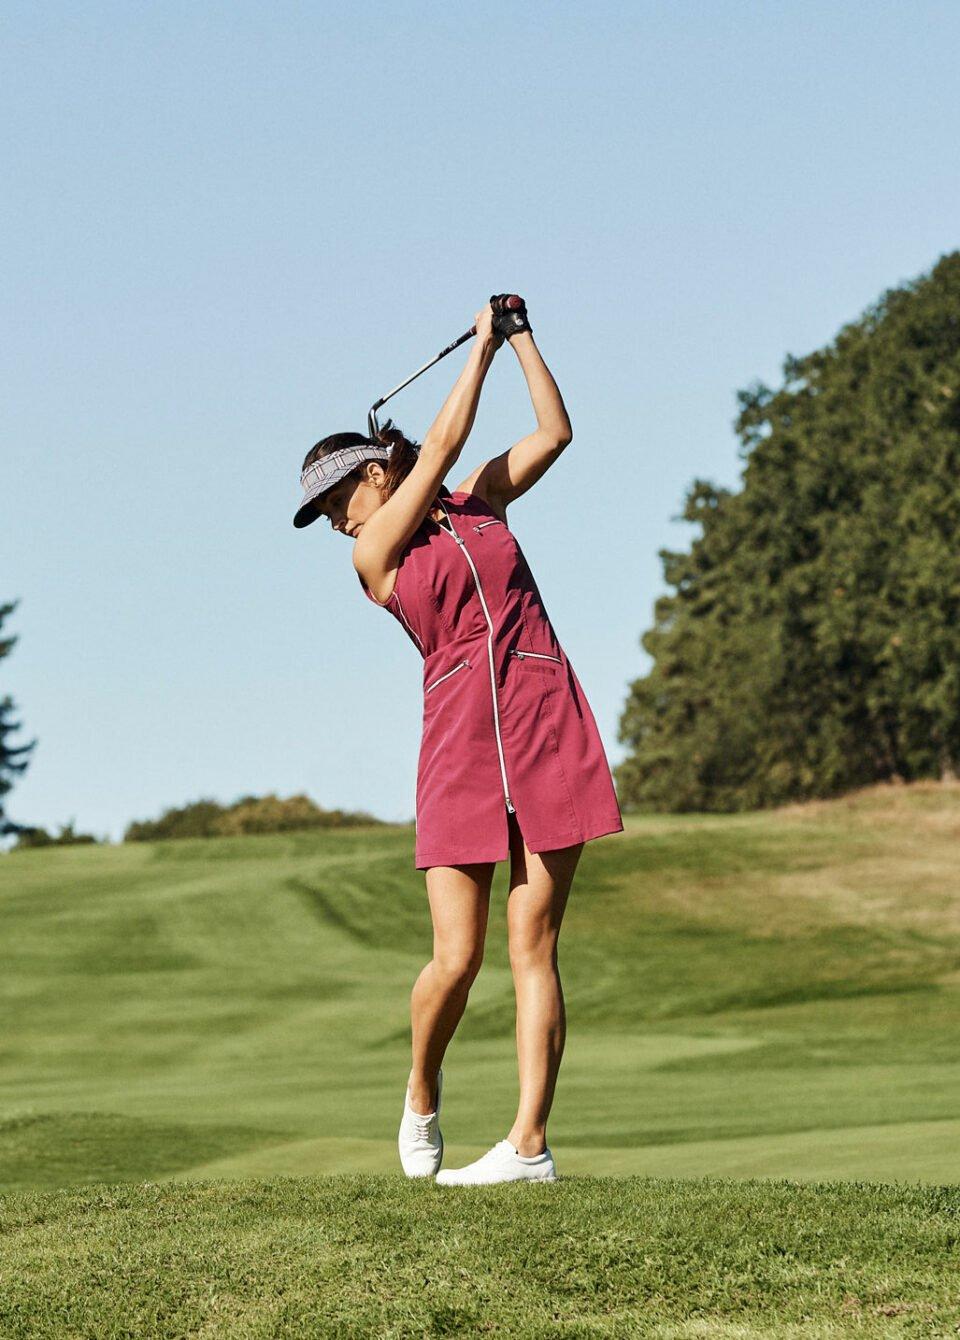 jenni-golf-swing